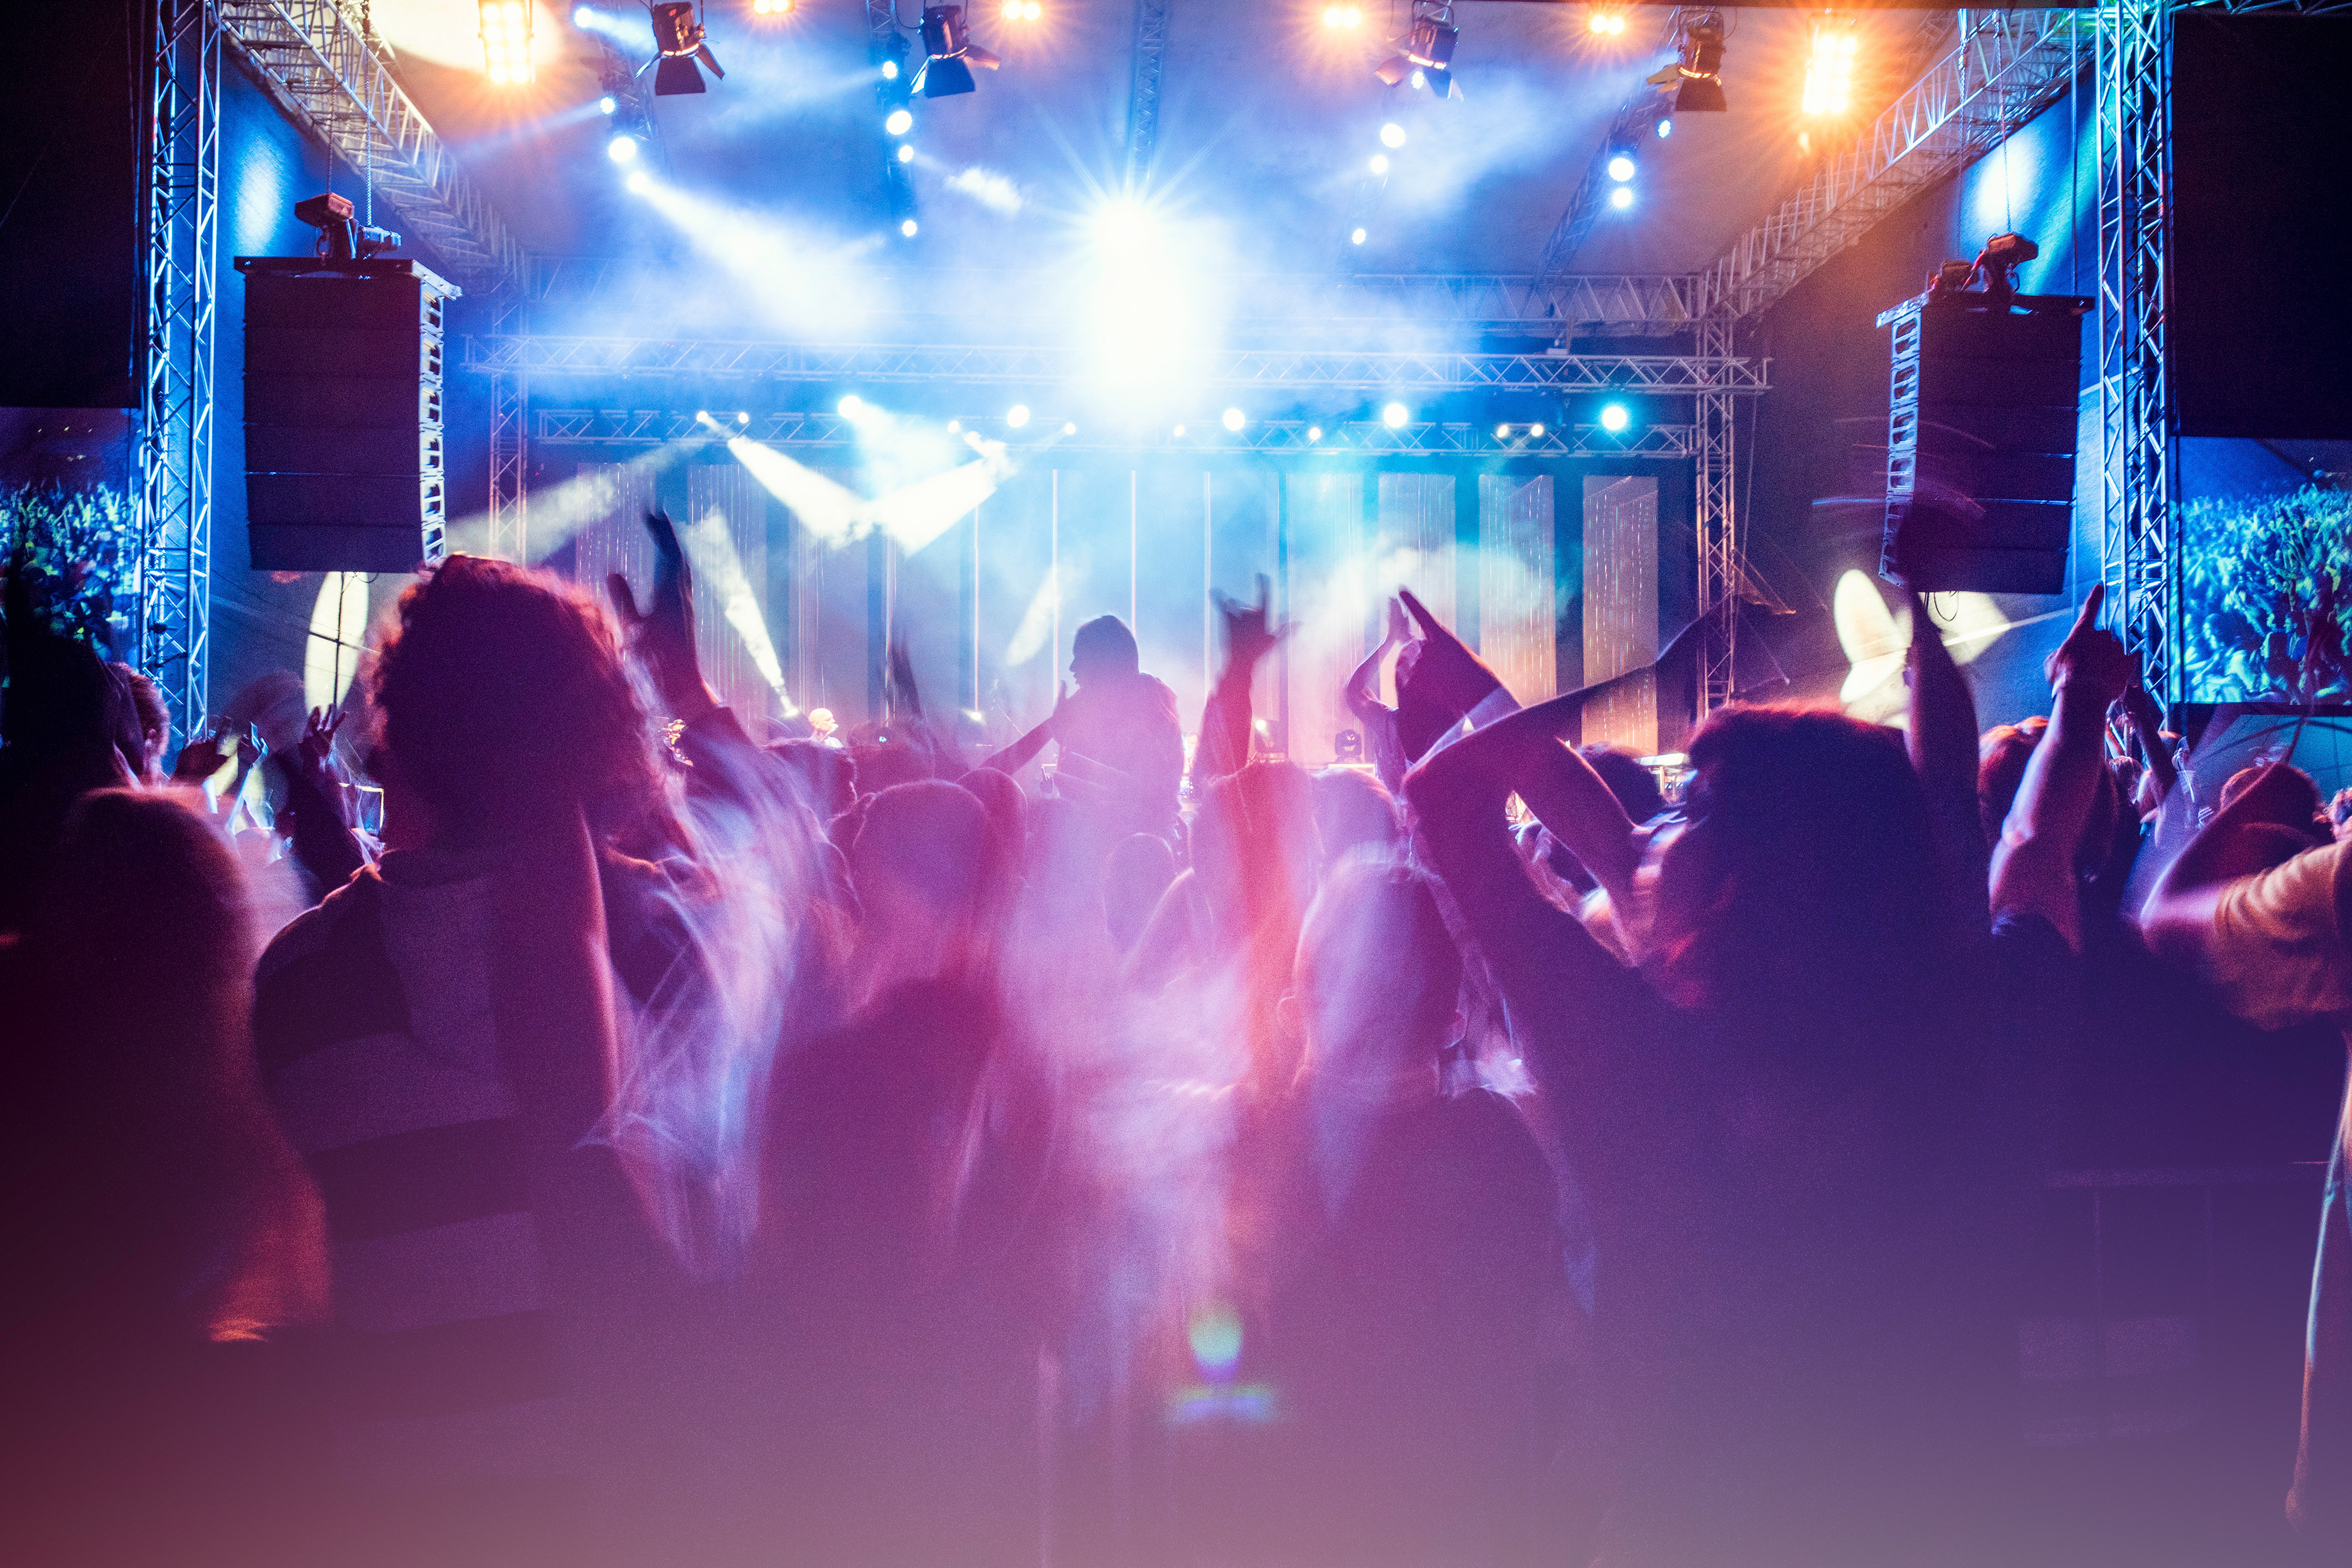 Event Deal Hotel Rates In Orlando - Orlando Concert